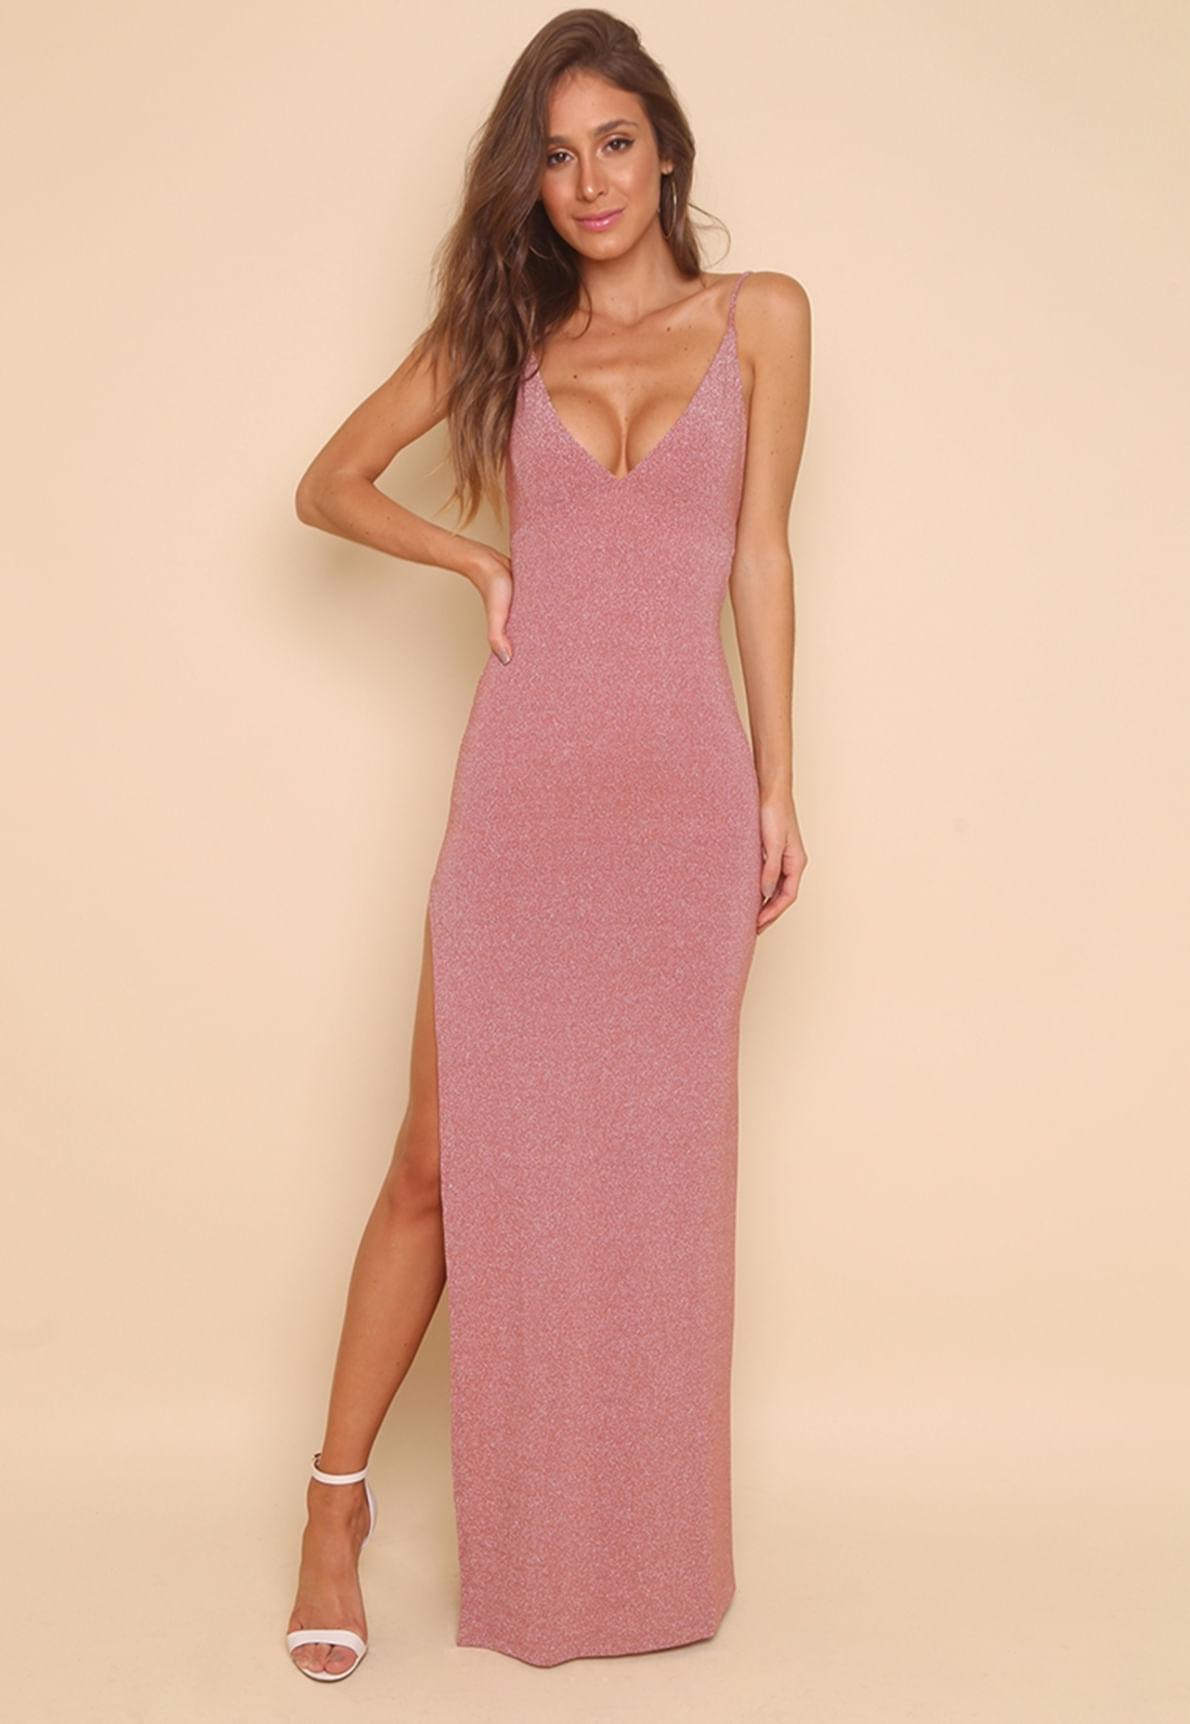 27445-vestido-longo-rose-sabrine-mundo-lolita-01